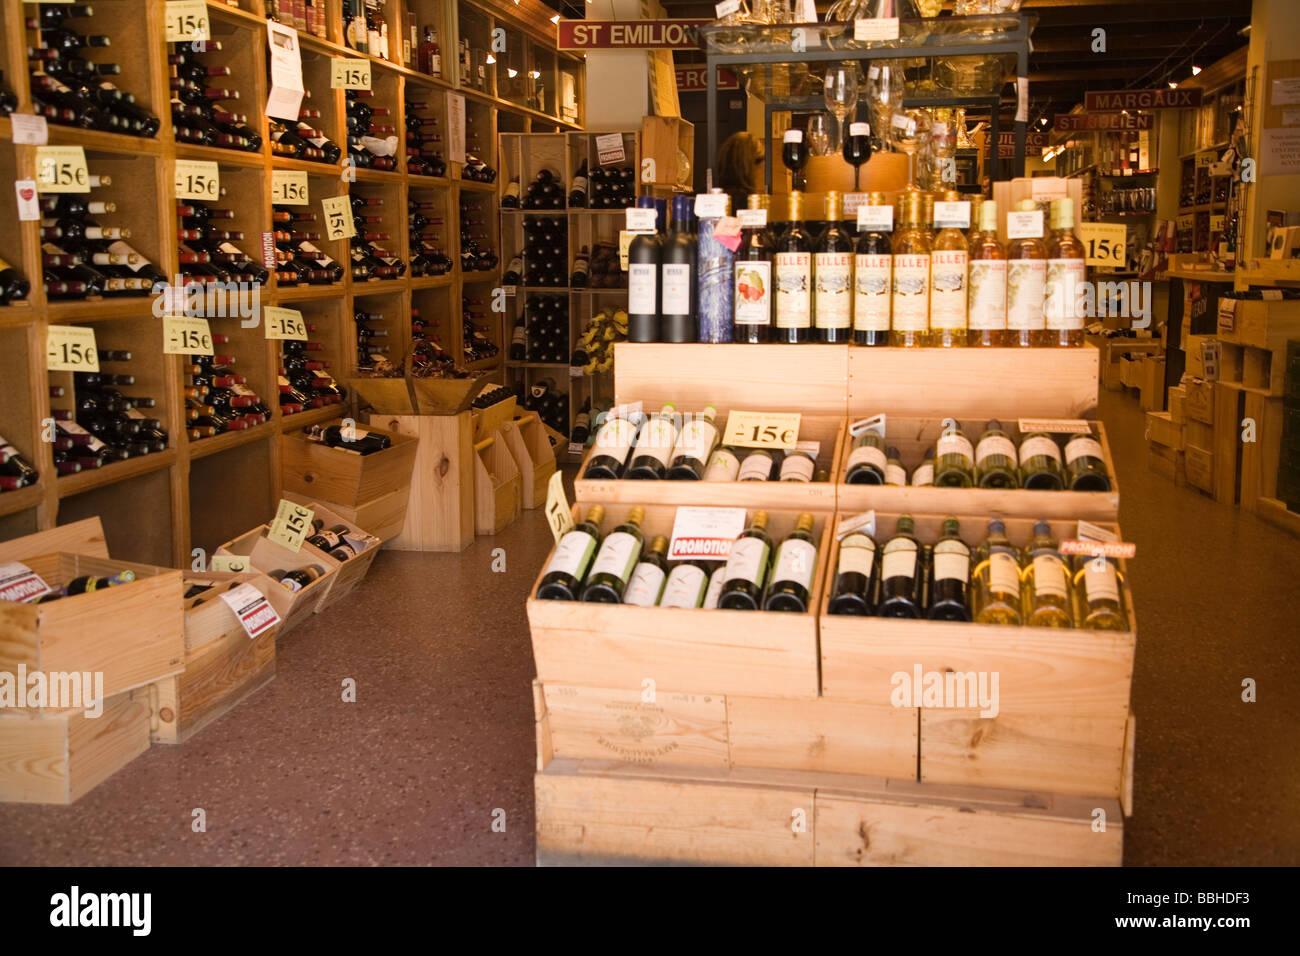 wine shop display in bordeaux france stock photo royalty. Black Bedroom Furniture Sets. Home Design Ideas